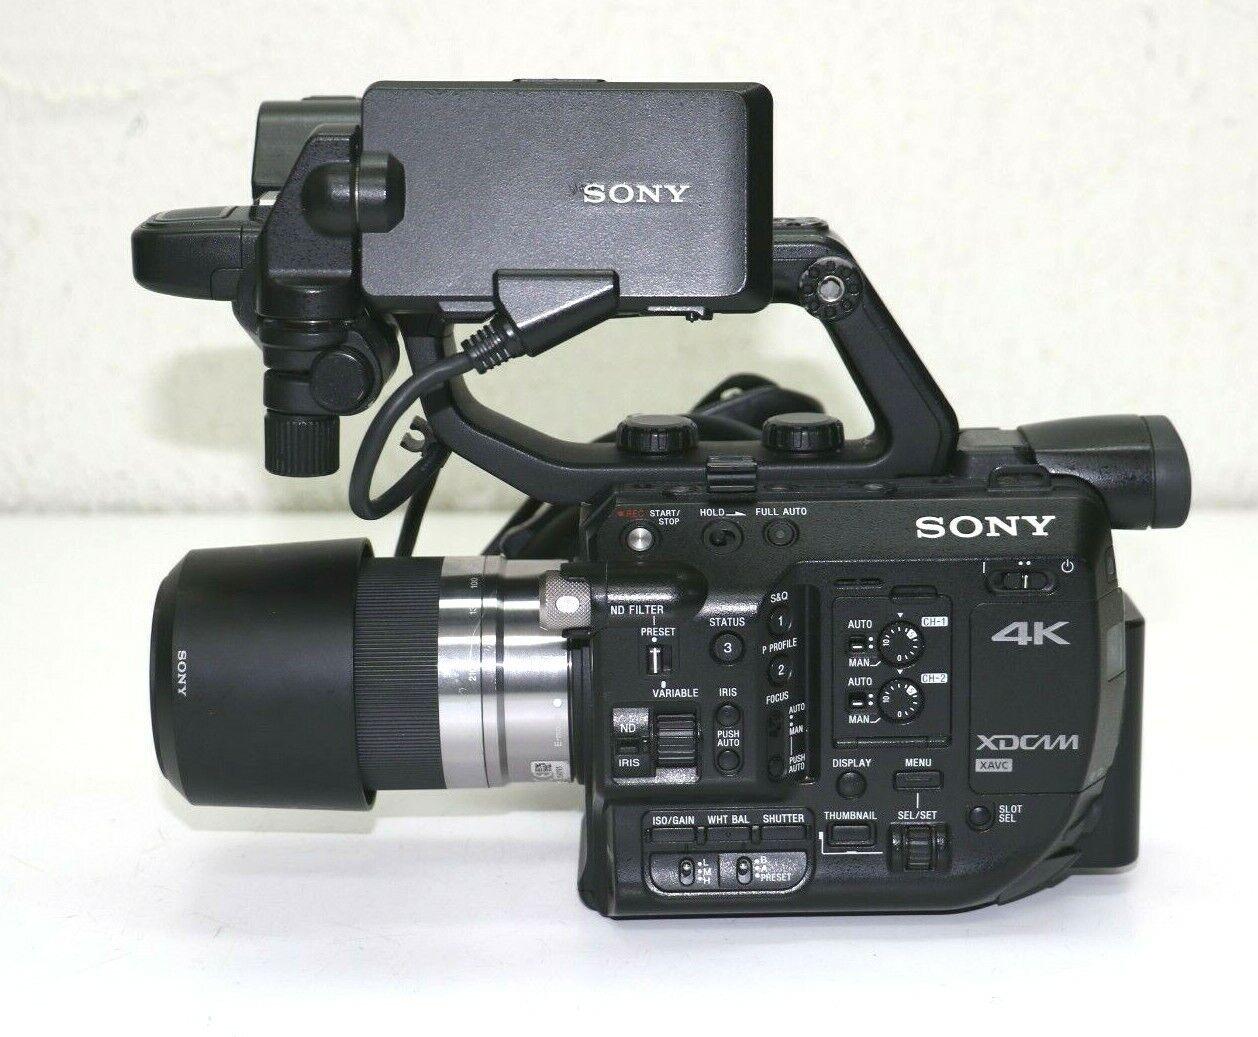 s l1600 - Sony PXW-FS5 XDCAM 4K Ultra HD Super 35 Camcorder E 4.5-6.3/55-210 OSS  Lens